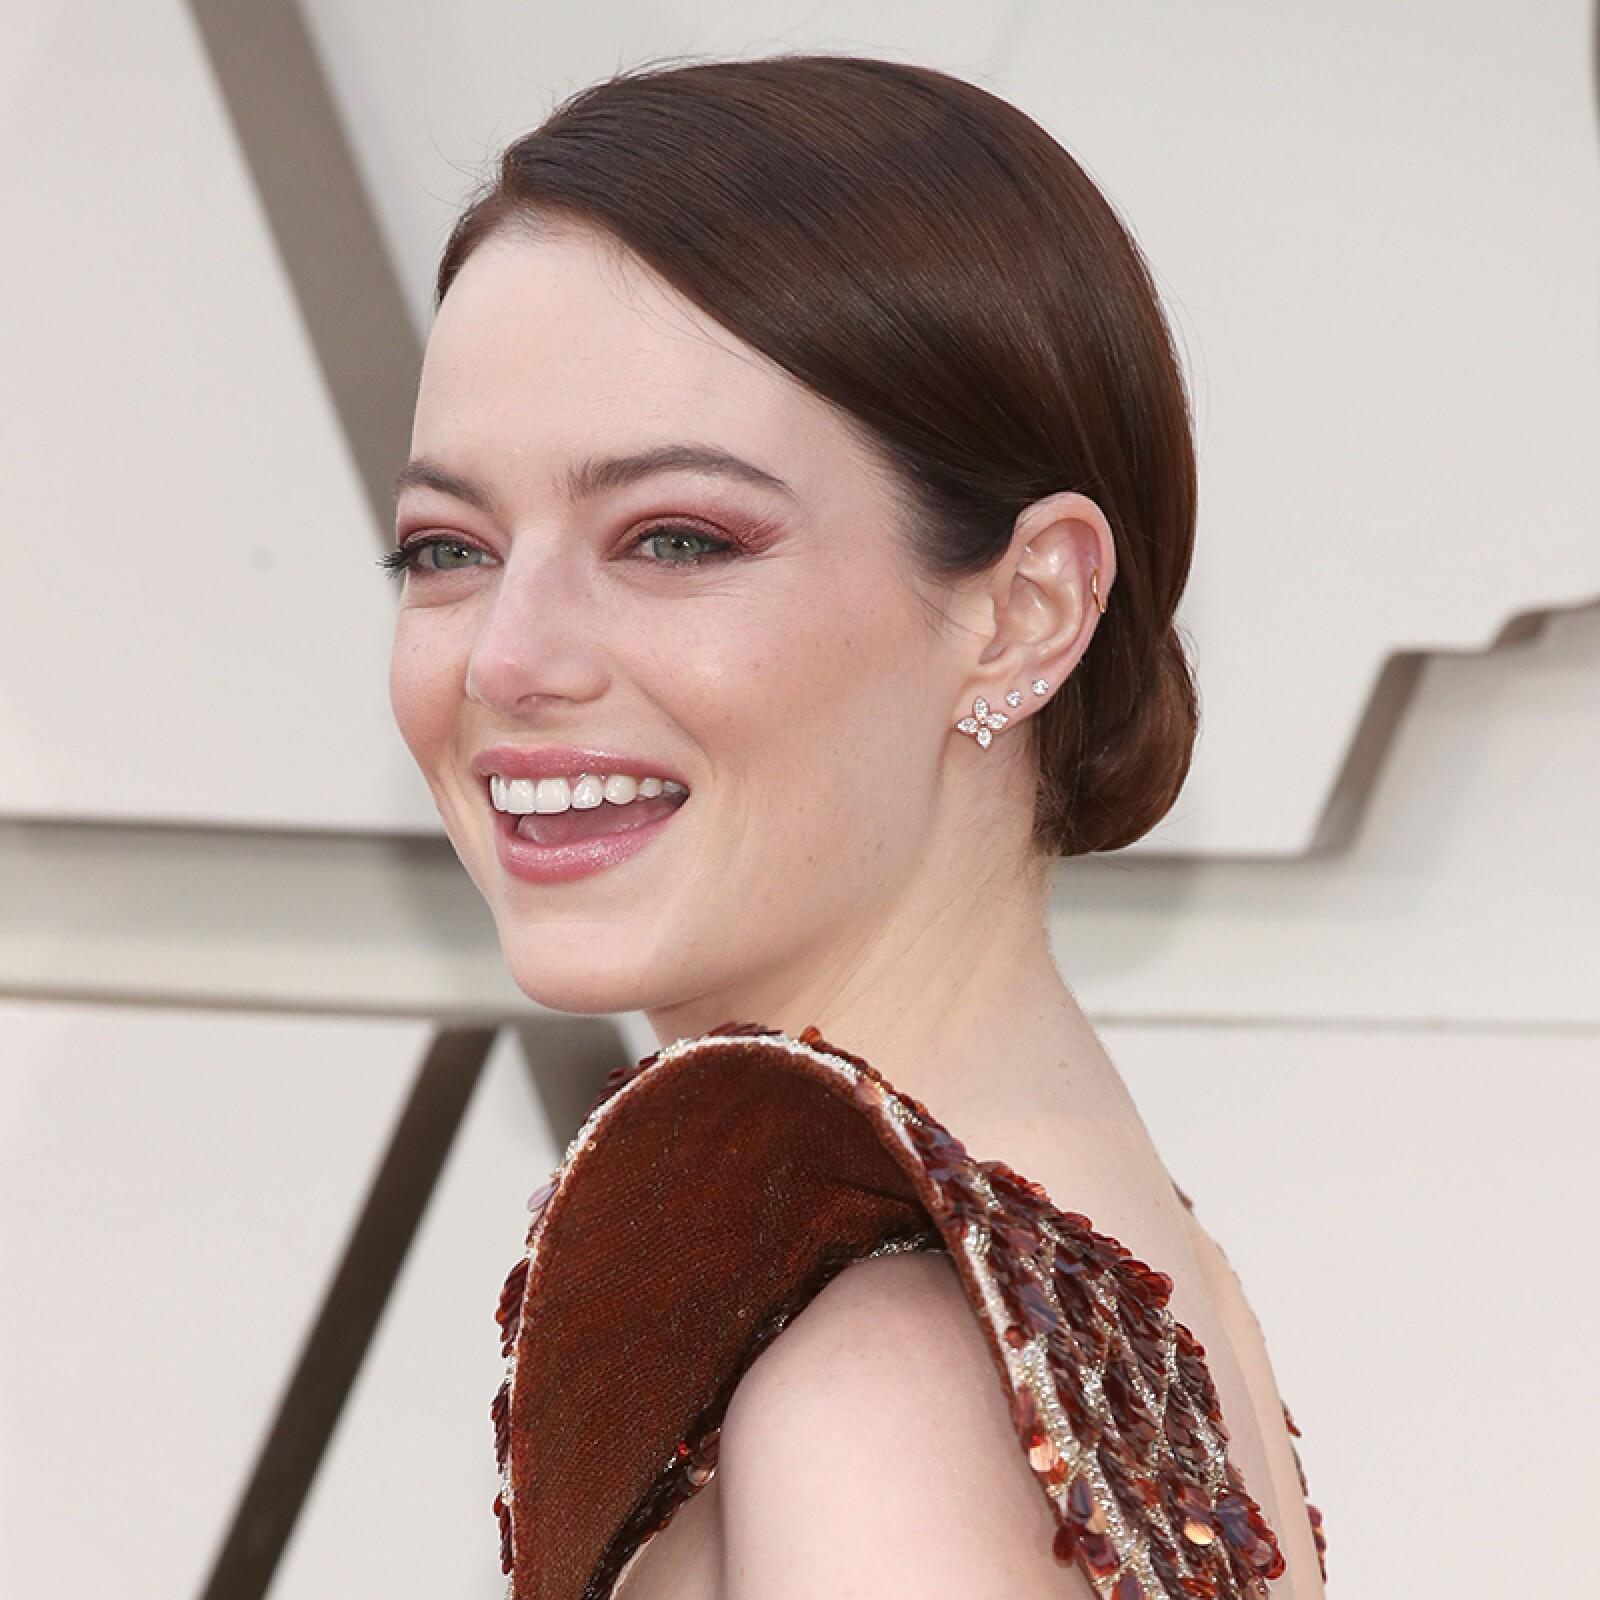 oscares-oscar-beauty-looks-alfombra-roja-academy-awards-Emma-Stone